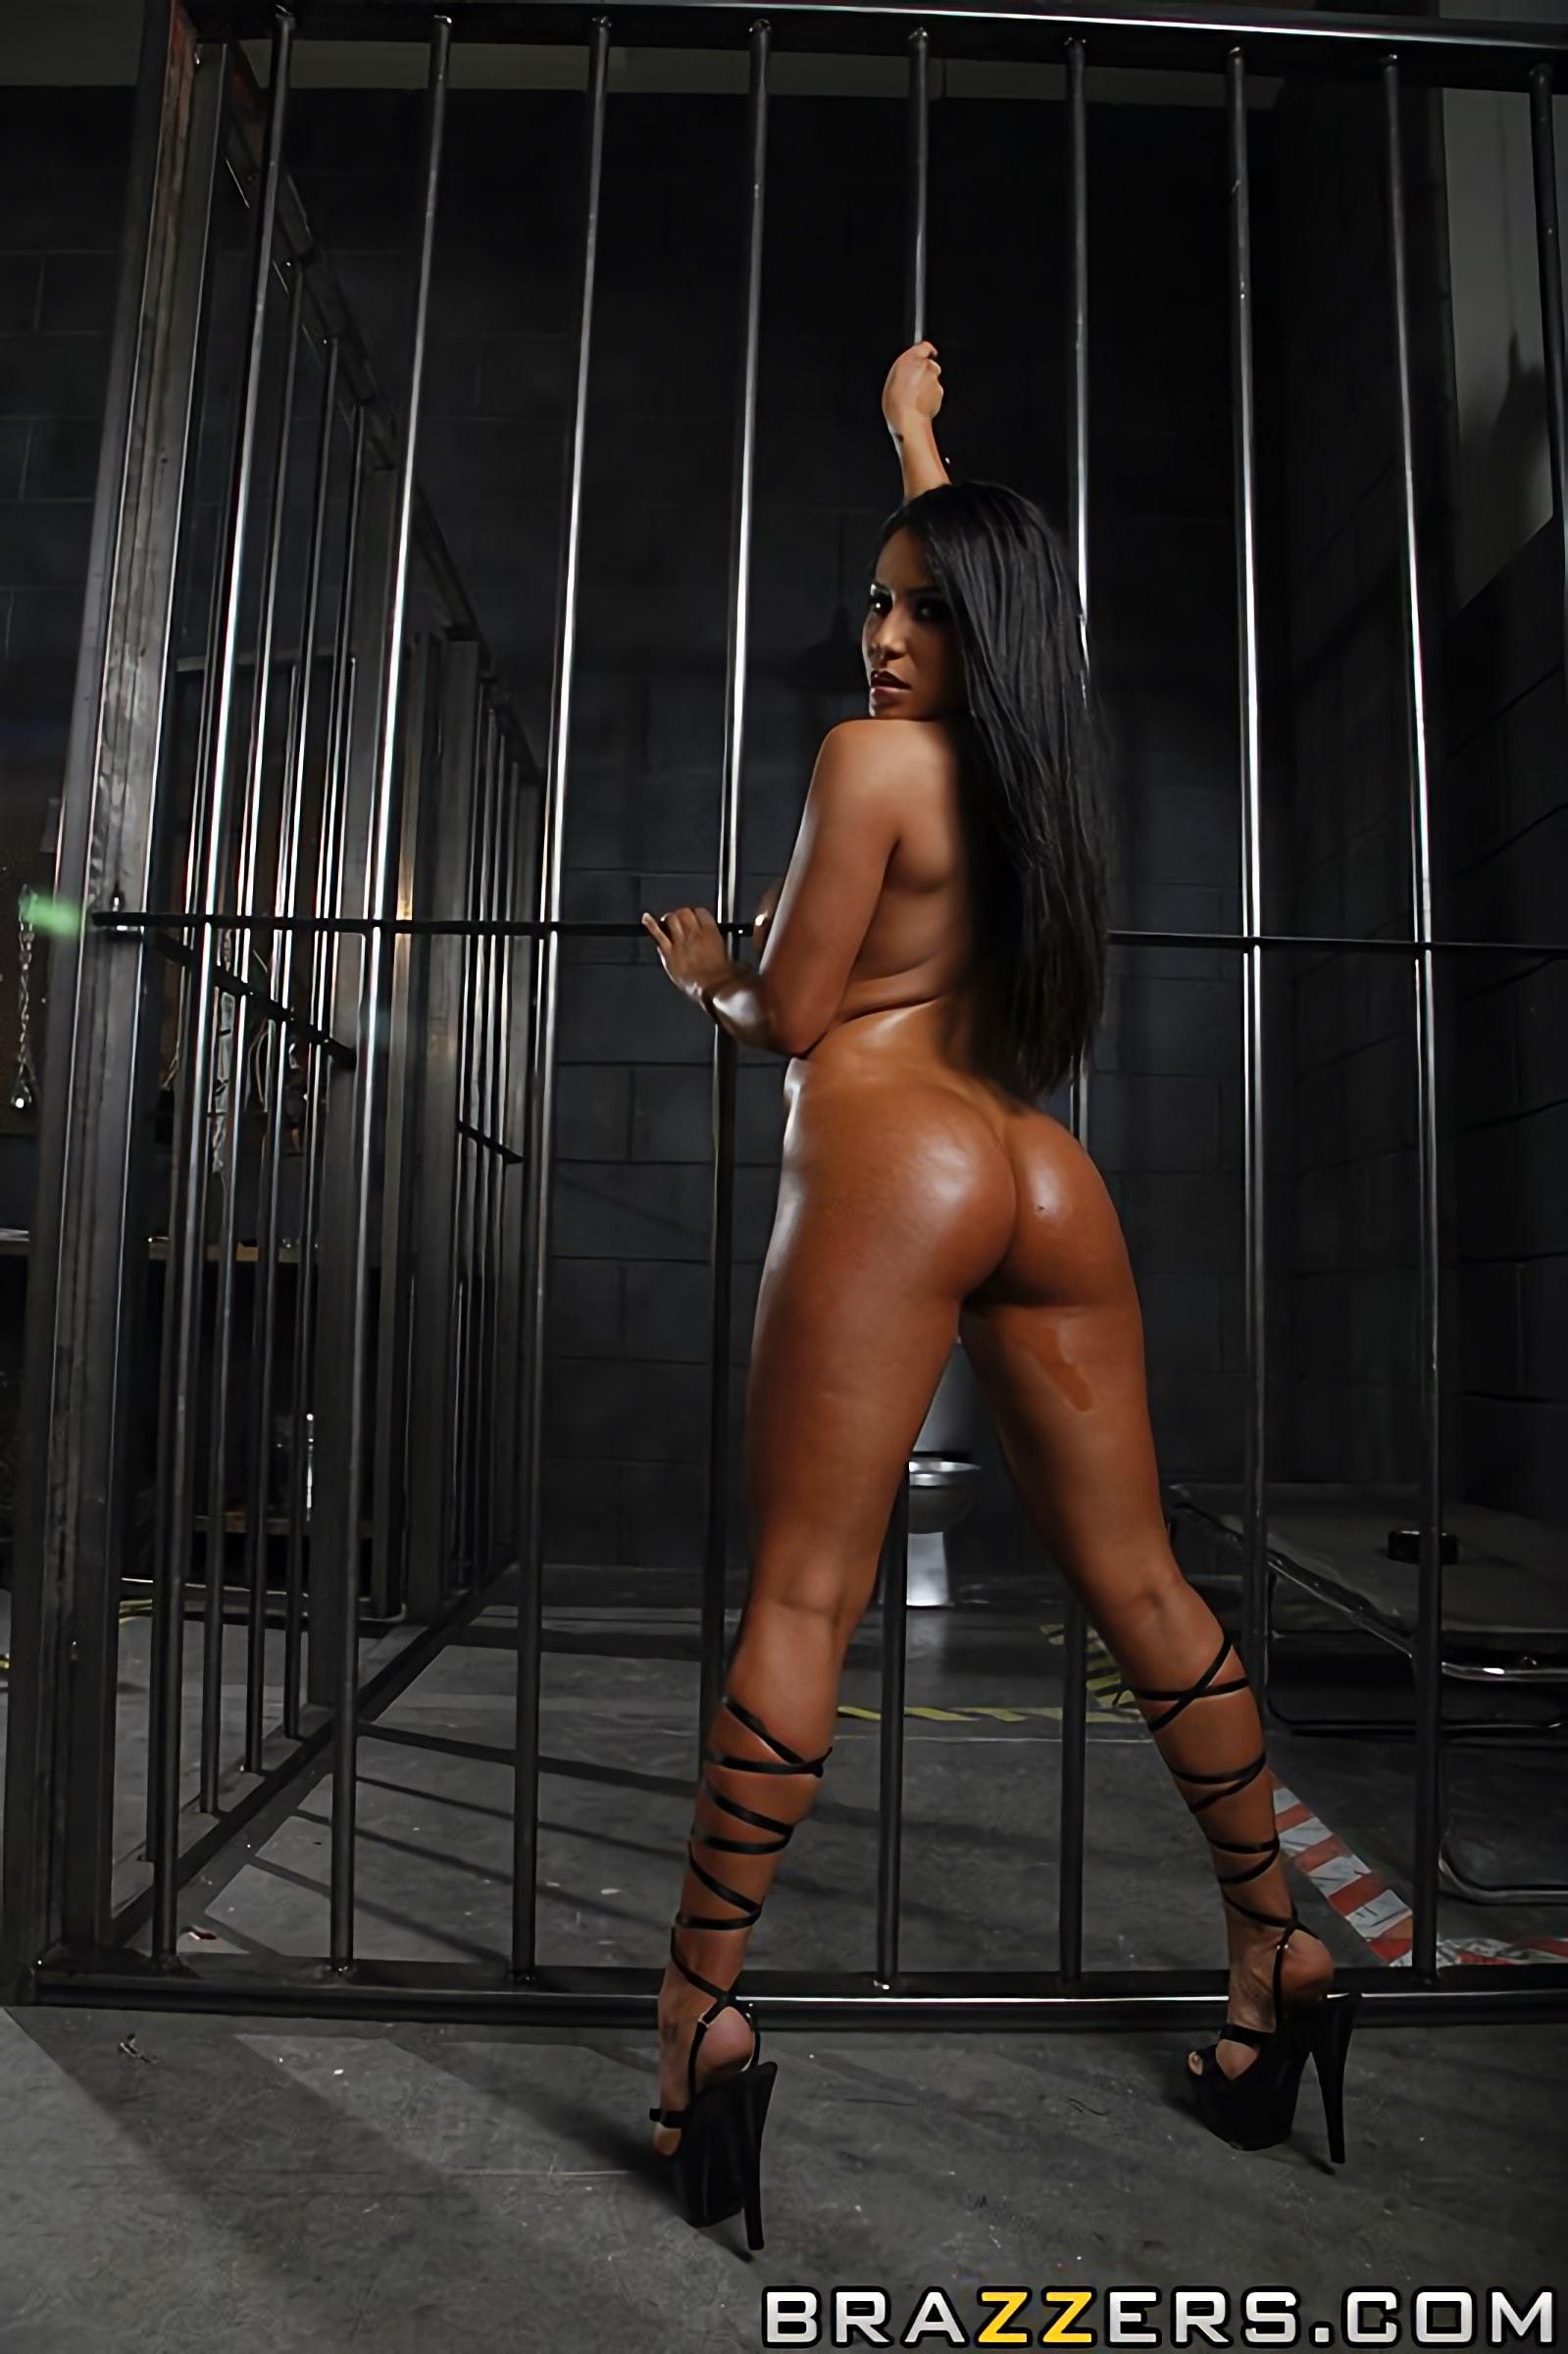 Jenaveve jolie rescuing a pornstar, miranda cosgrove stripped naked video